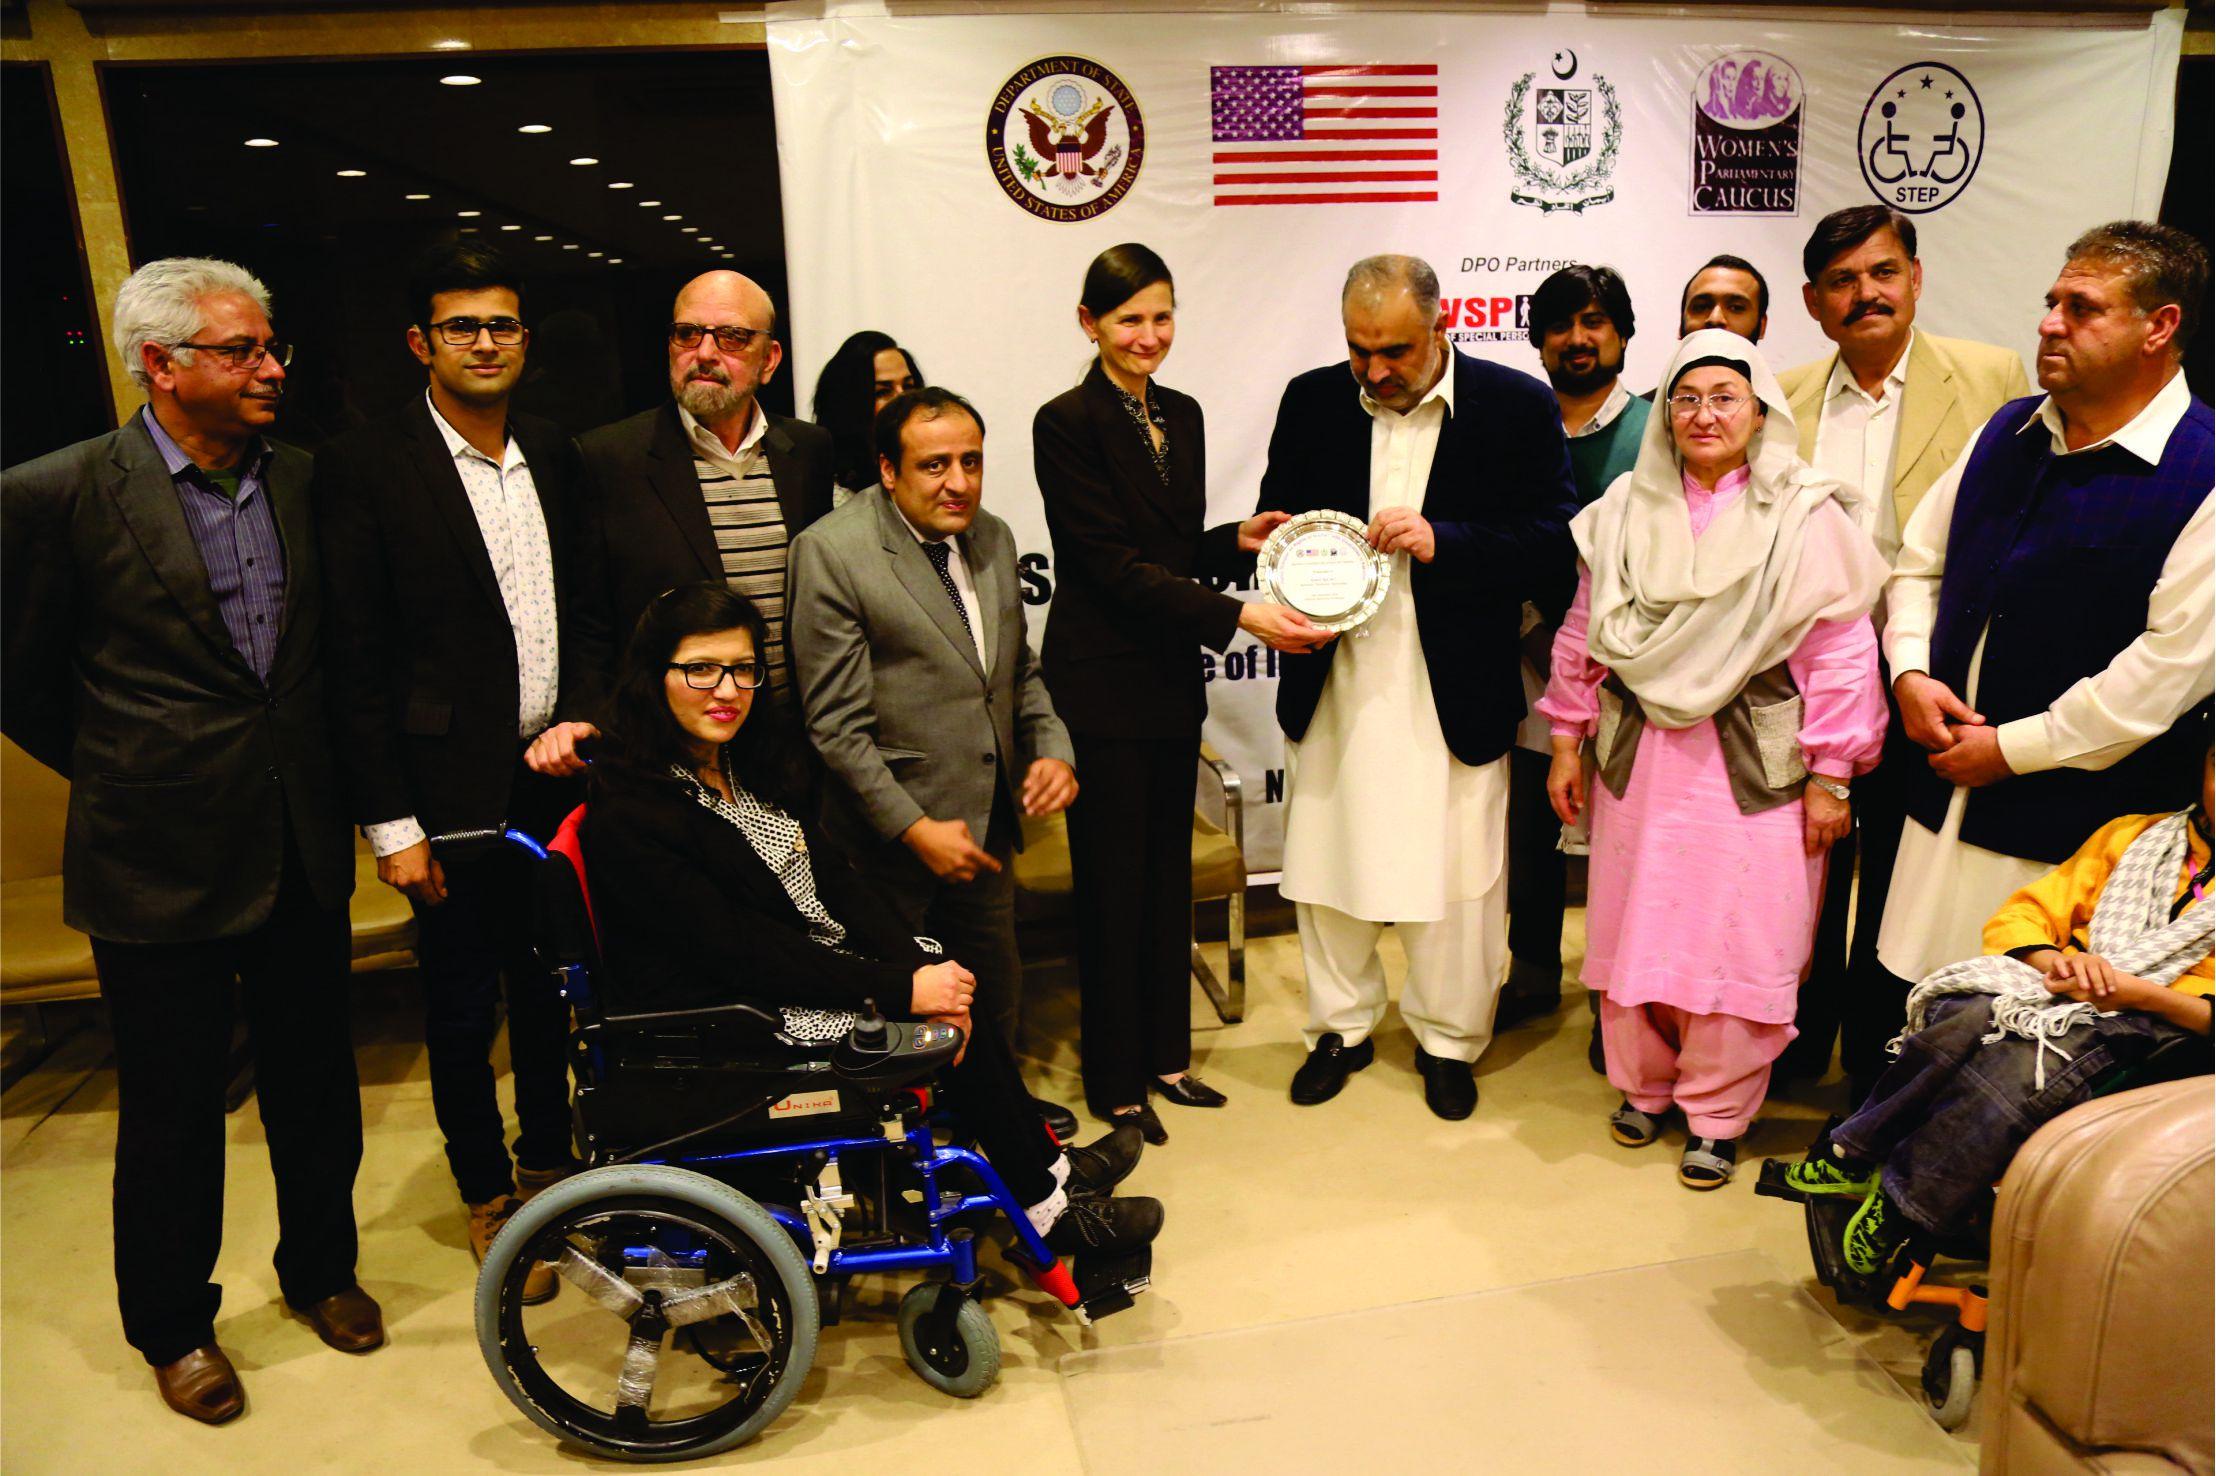 Speaker National Assembly Presenting Shield to US Embassy Representatives